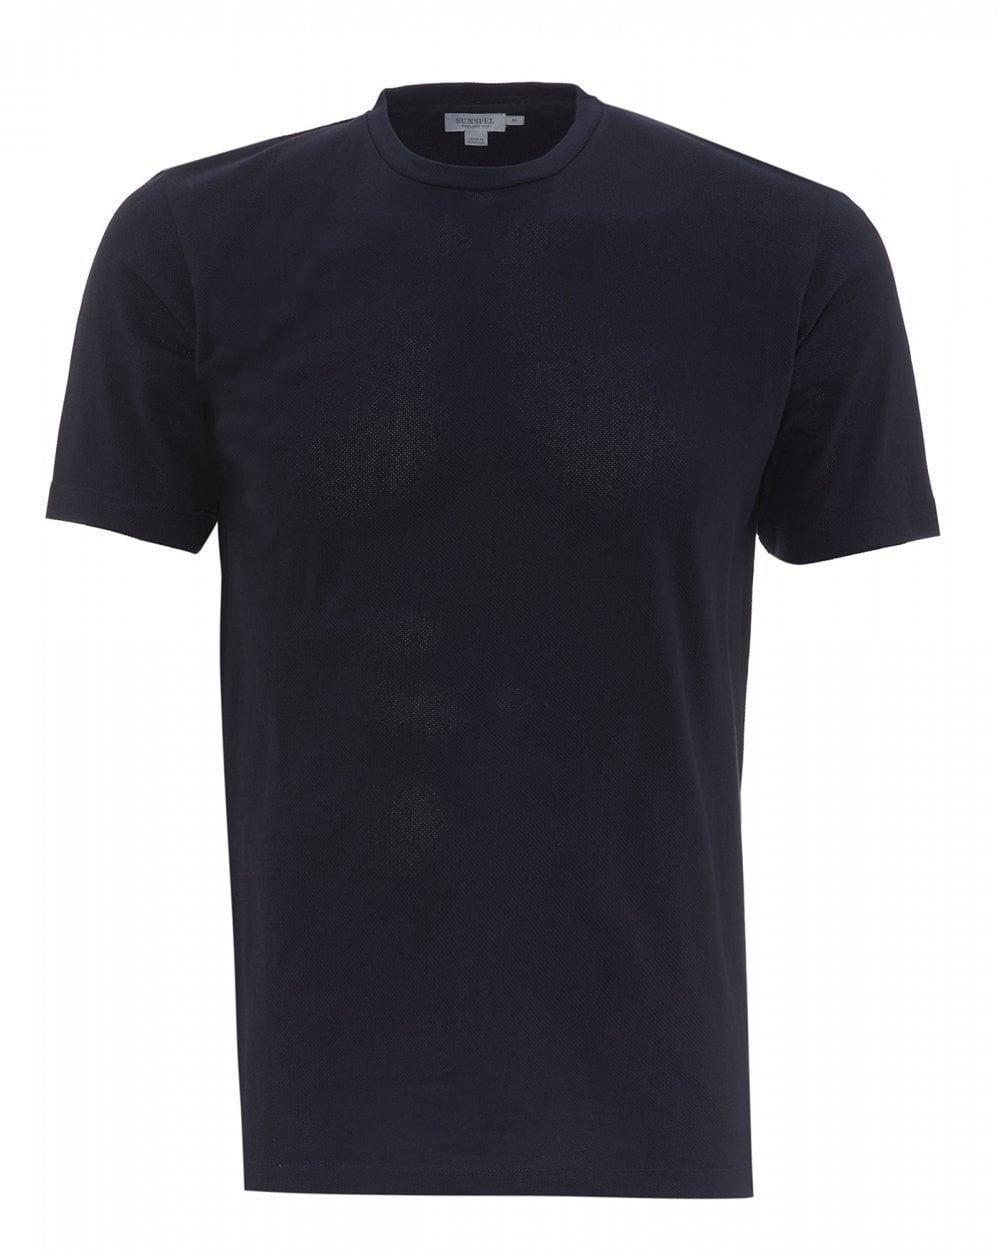 Sunspel Mens Riviera Mesh T-Shirt, Plain Navy Blue Tee